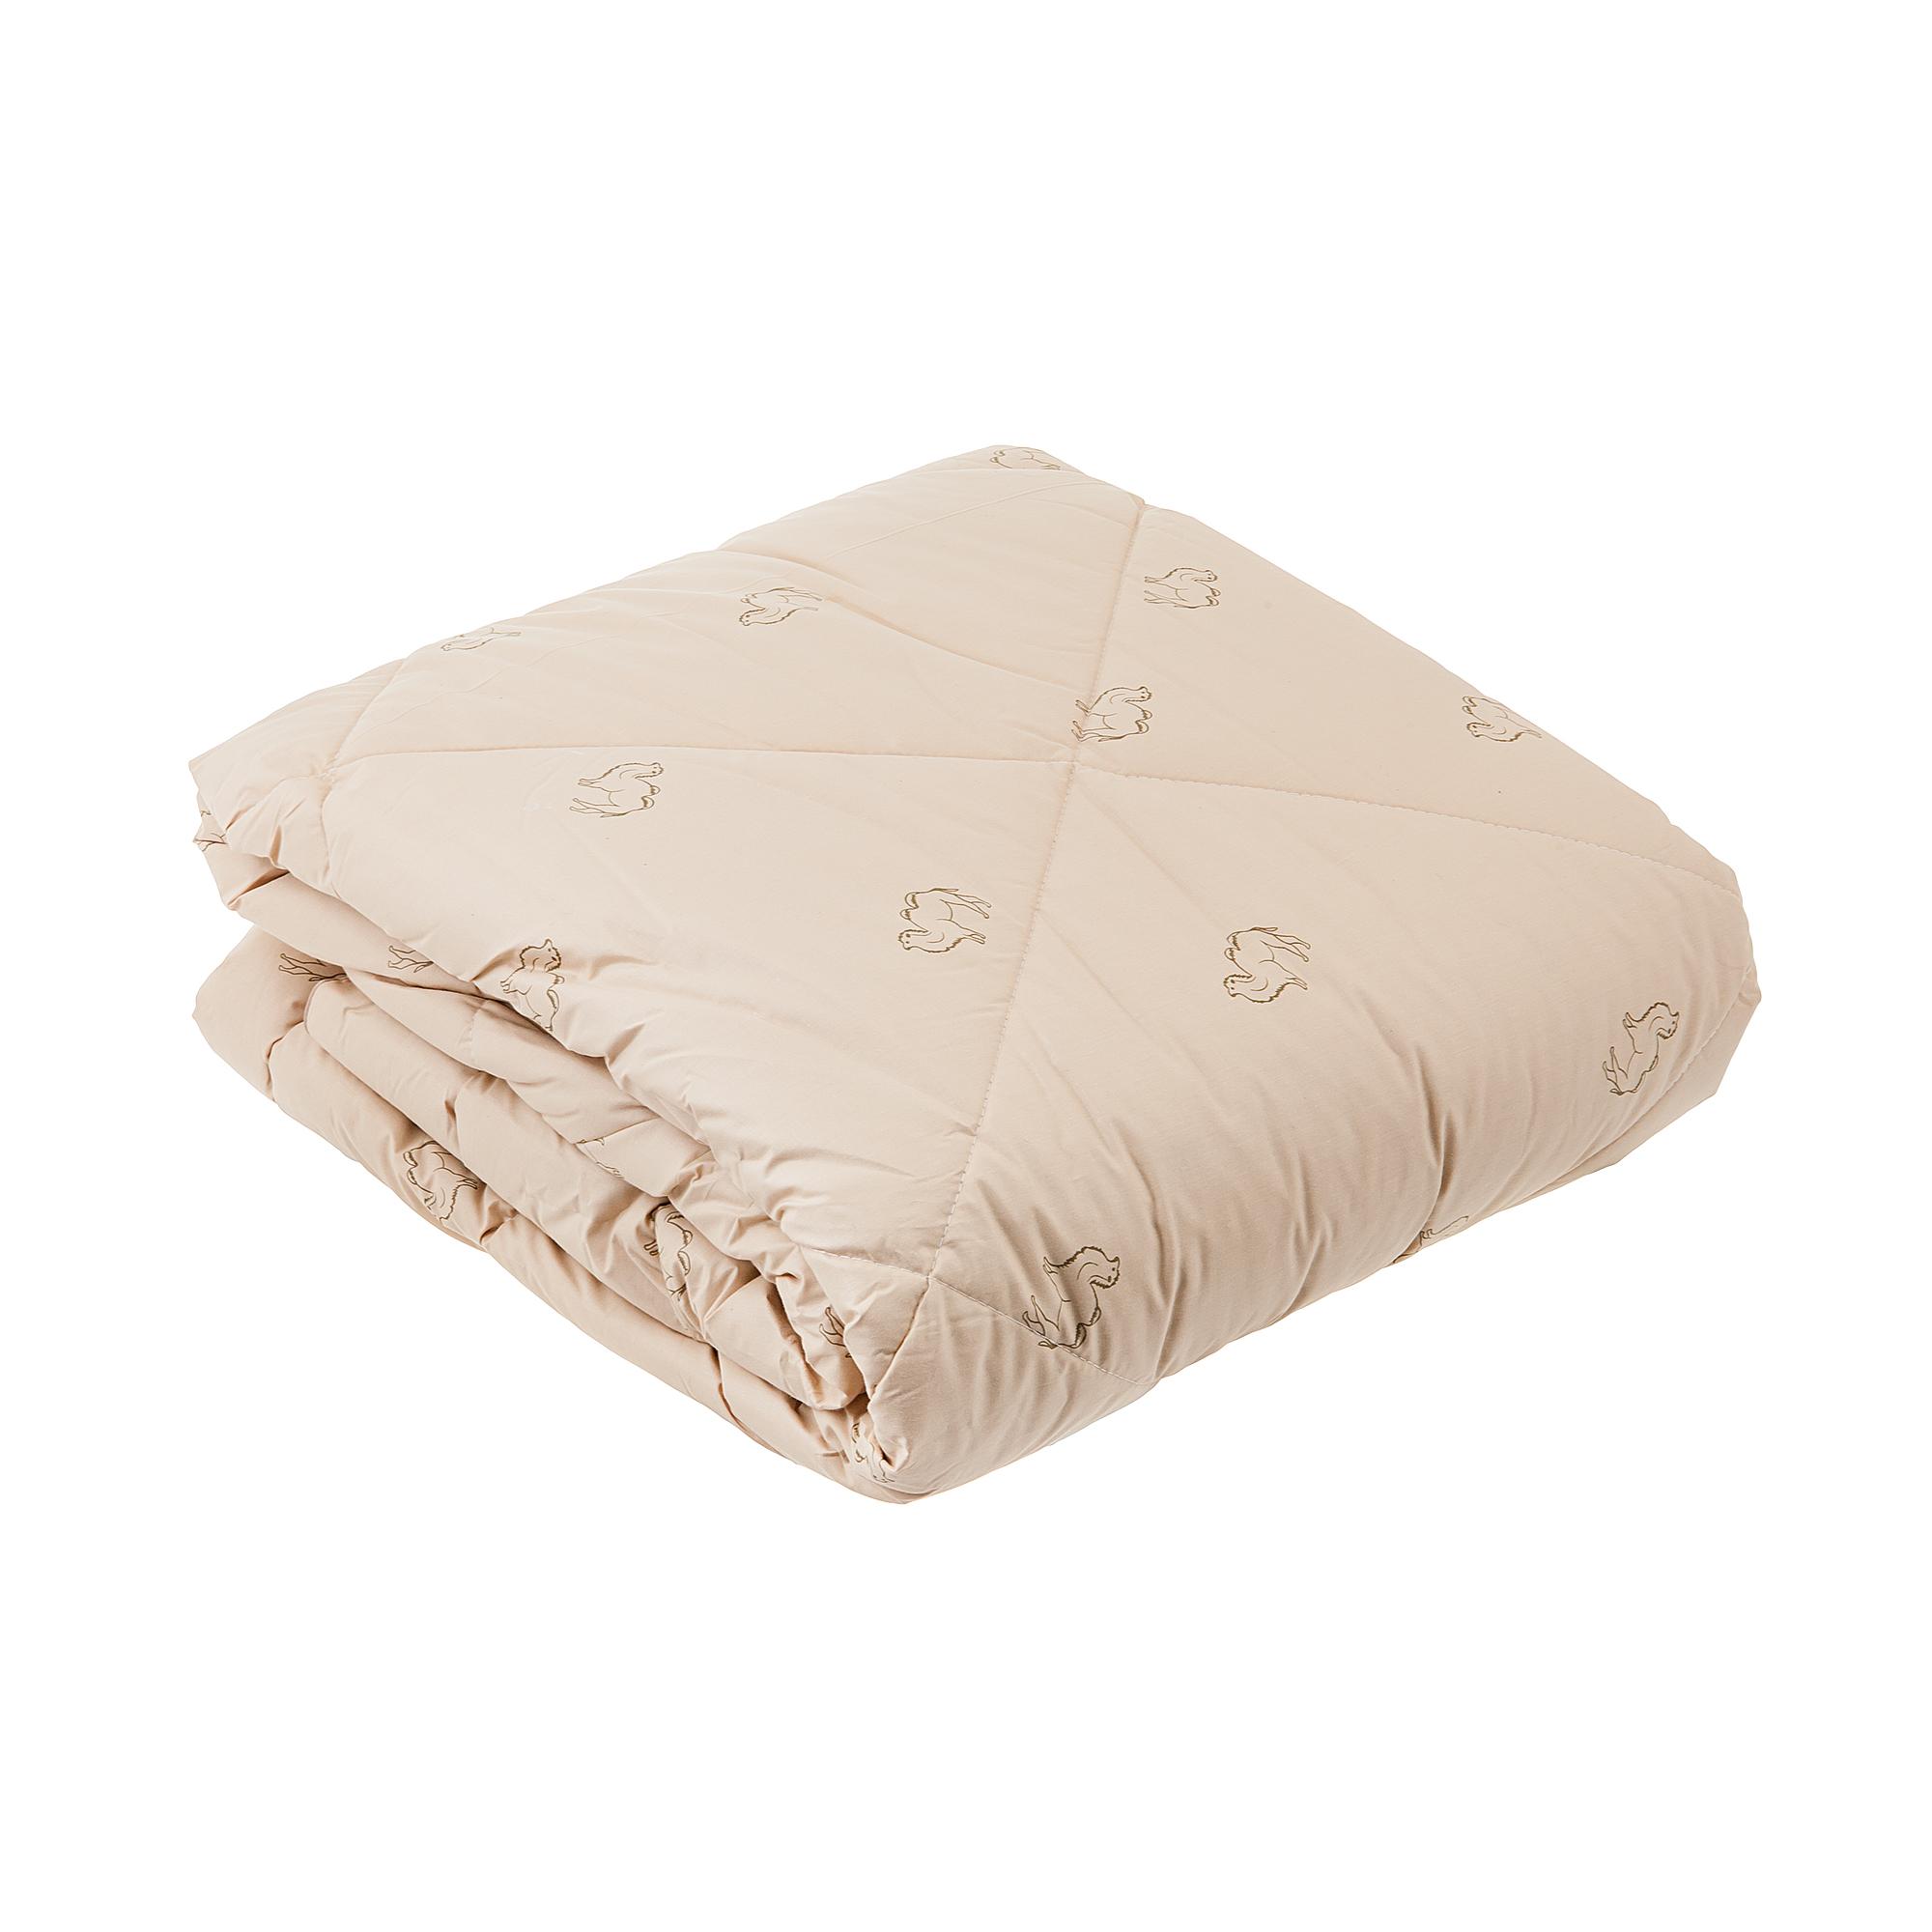 Одеяло стеганое легкое караван 200x220 Belashoff